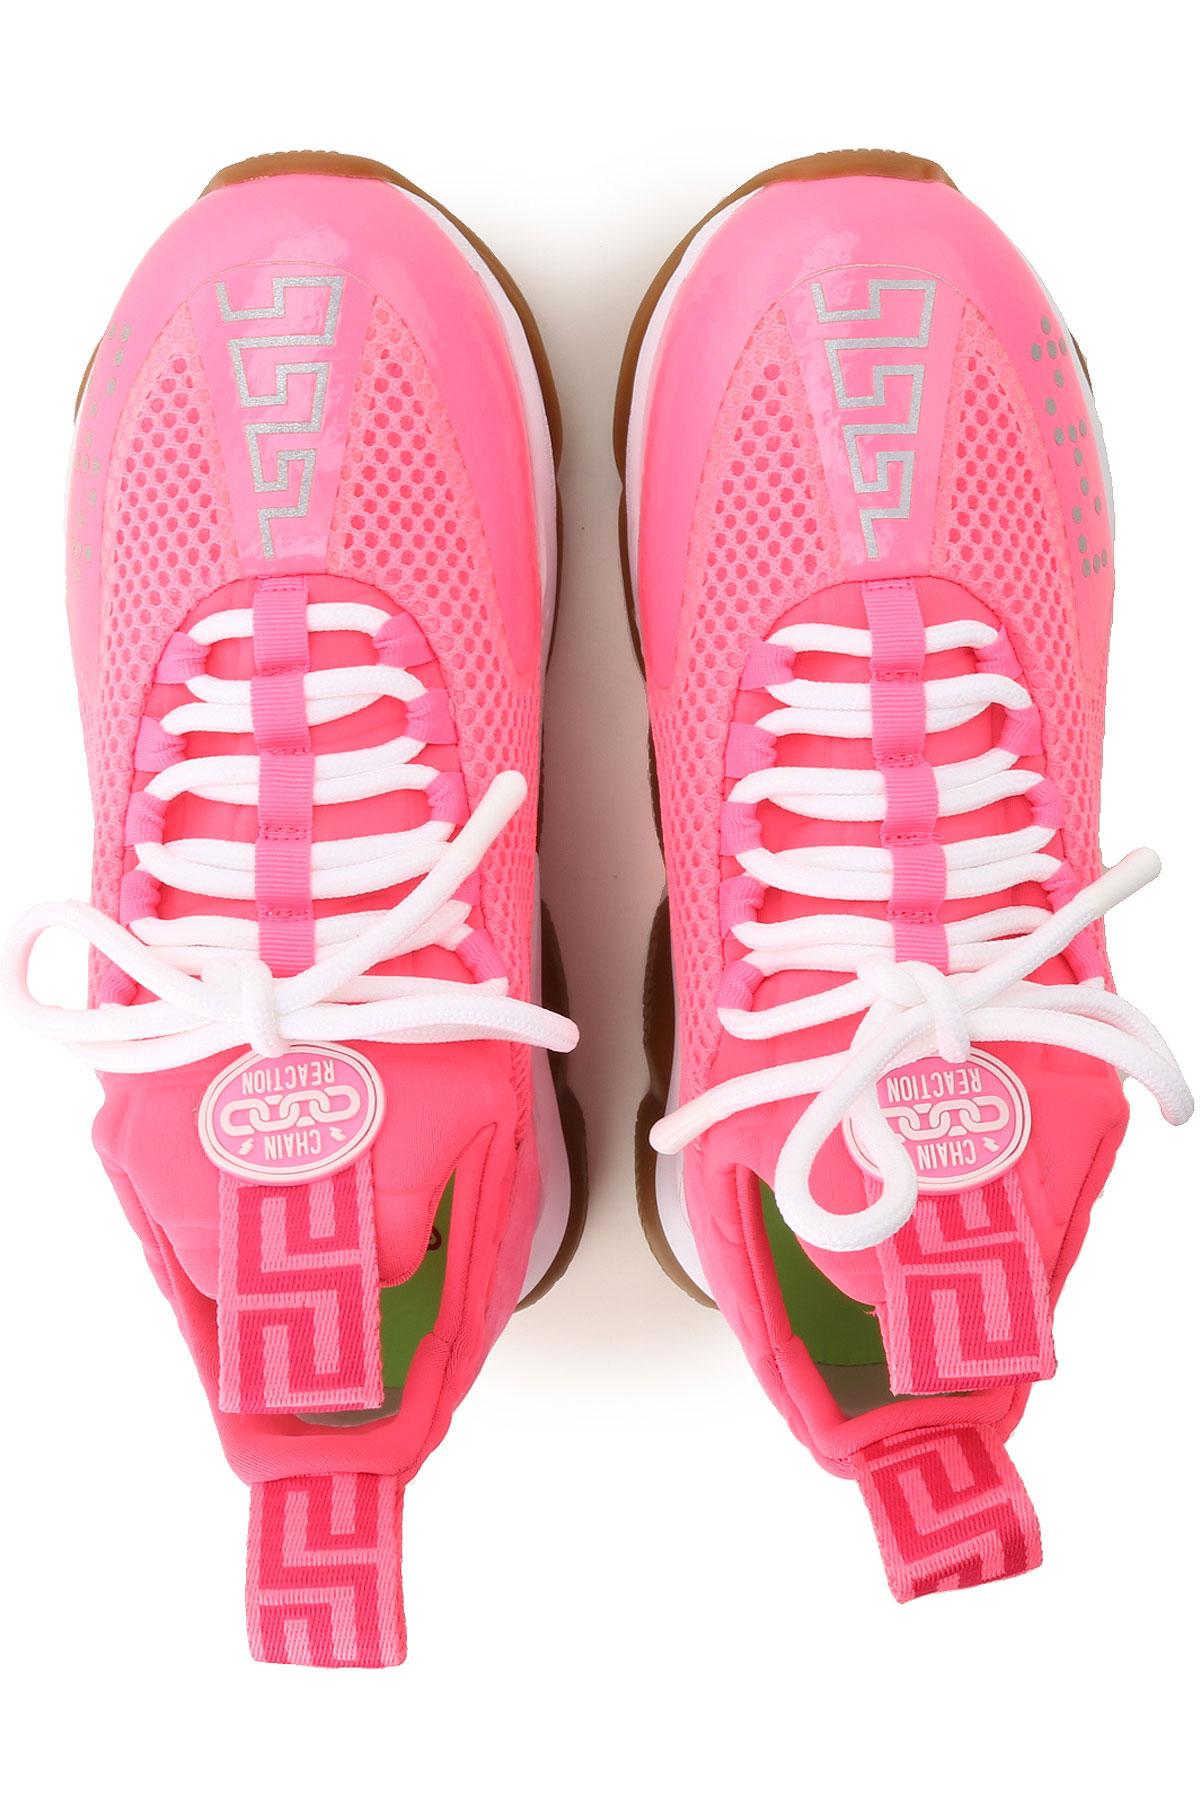 Gianni Shoes df5 codedsr857g Womens d23tg VersaceStyle 8wnmONv0